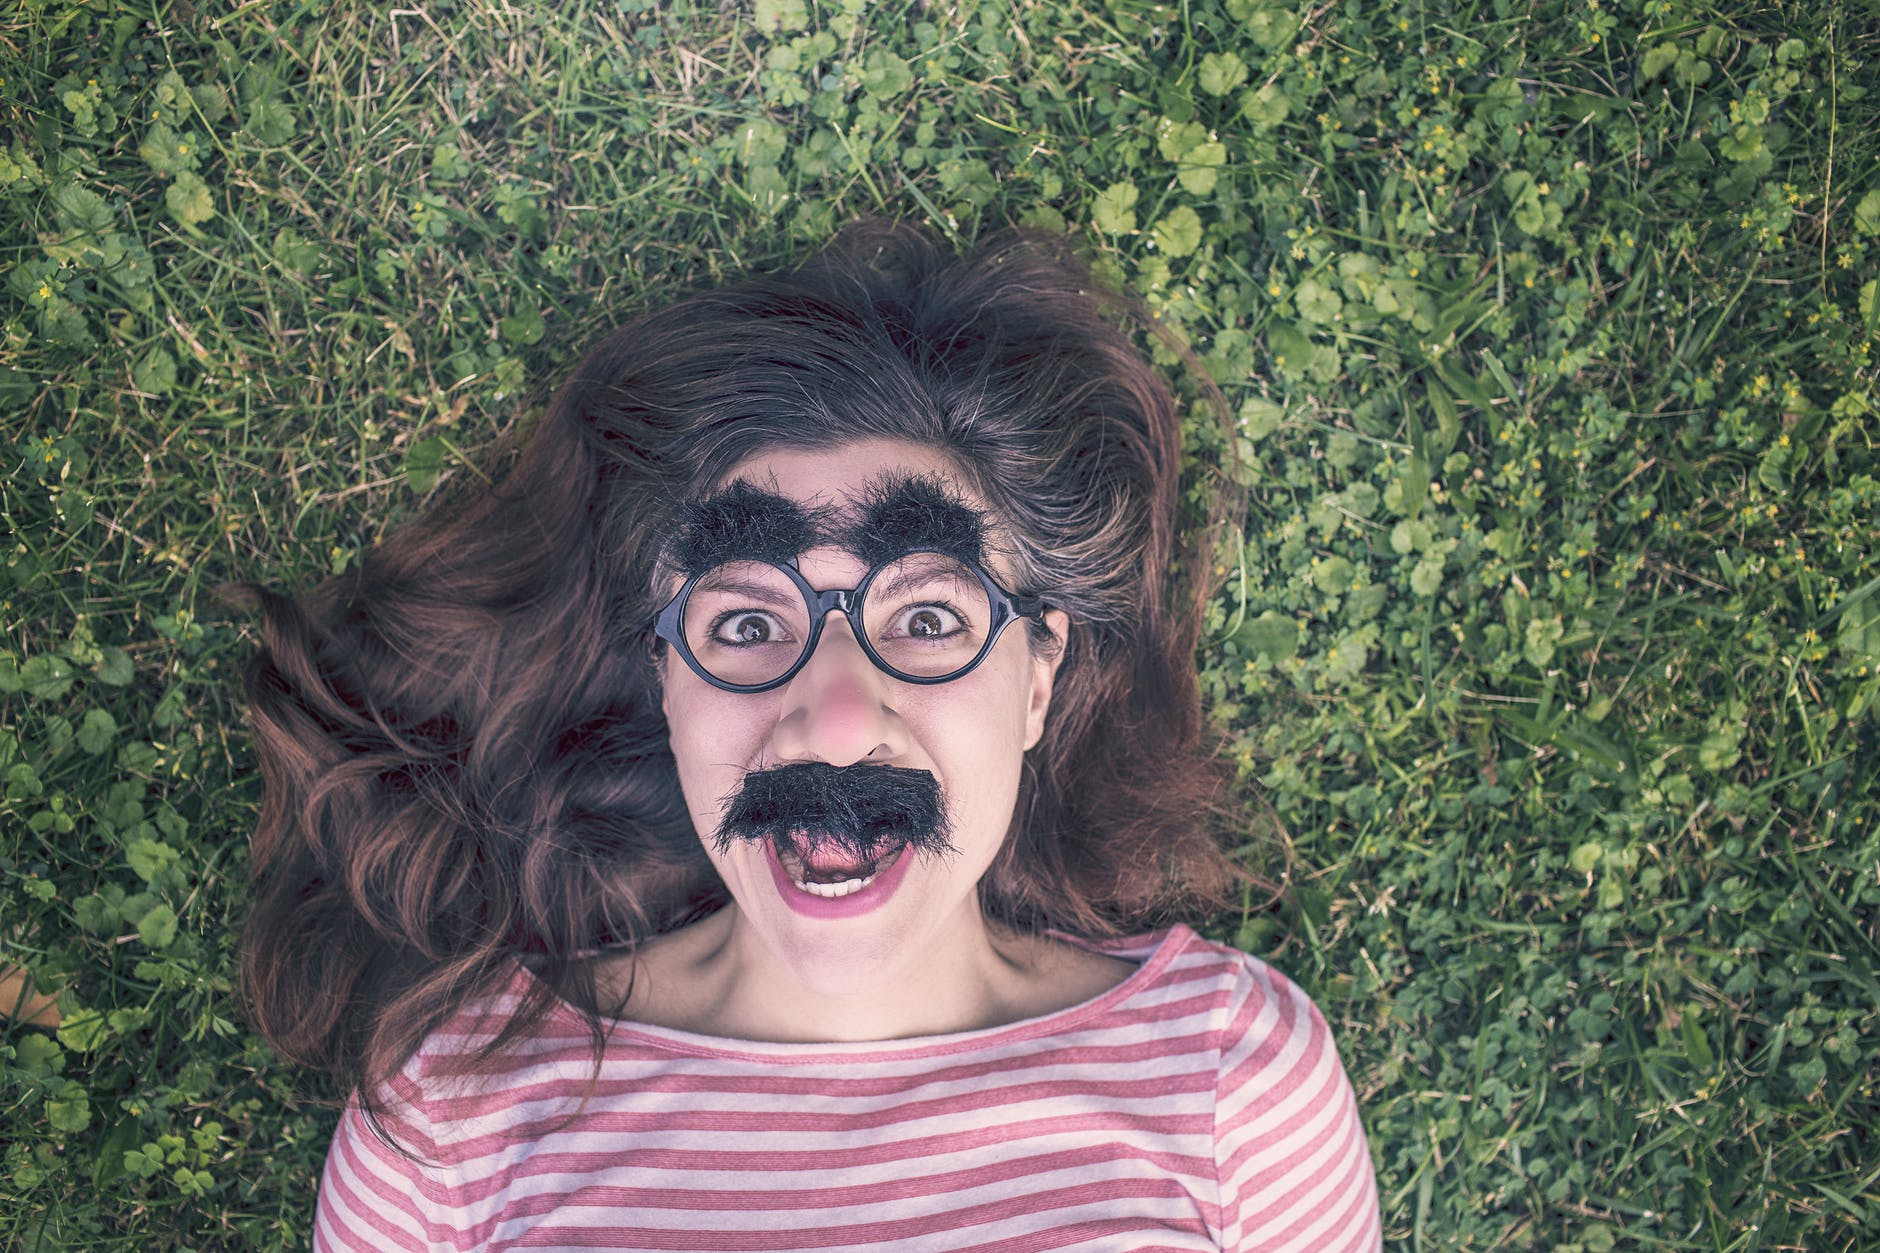 man person woman face